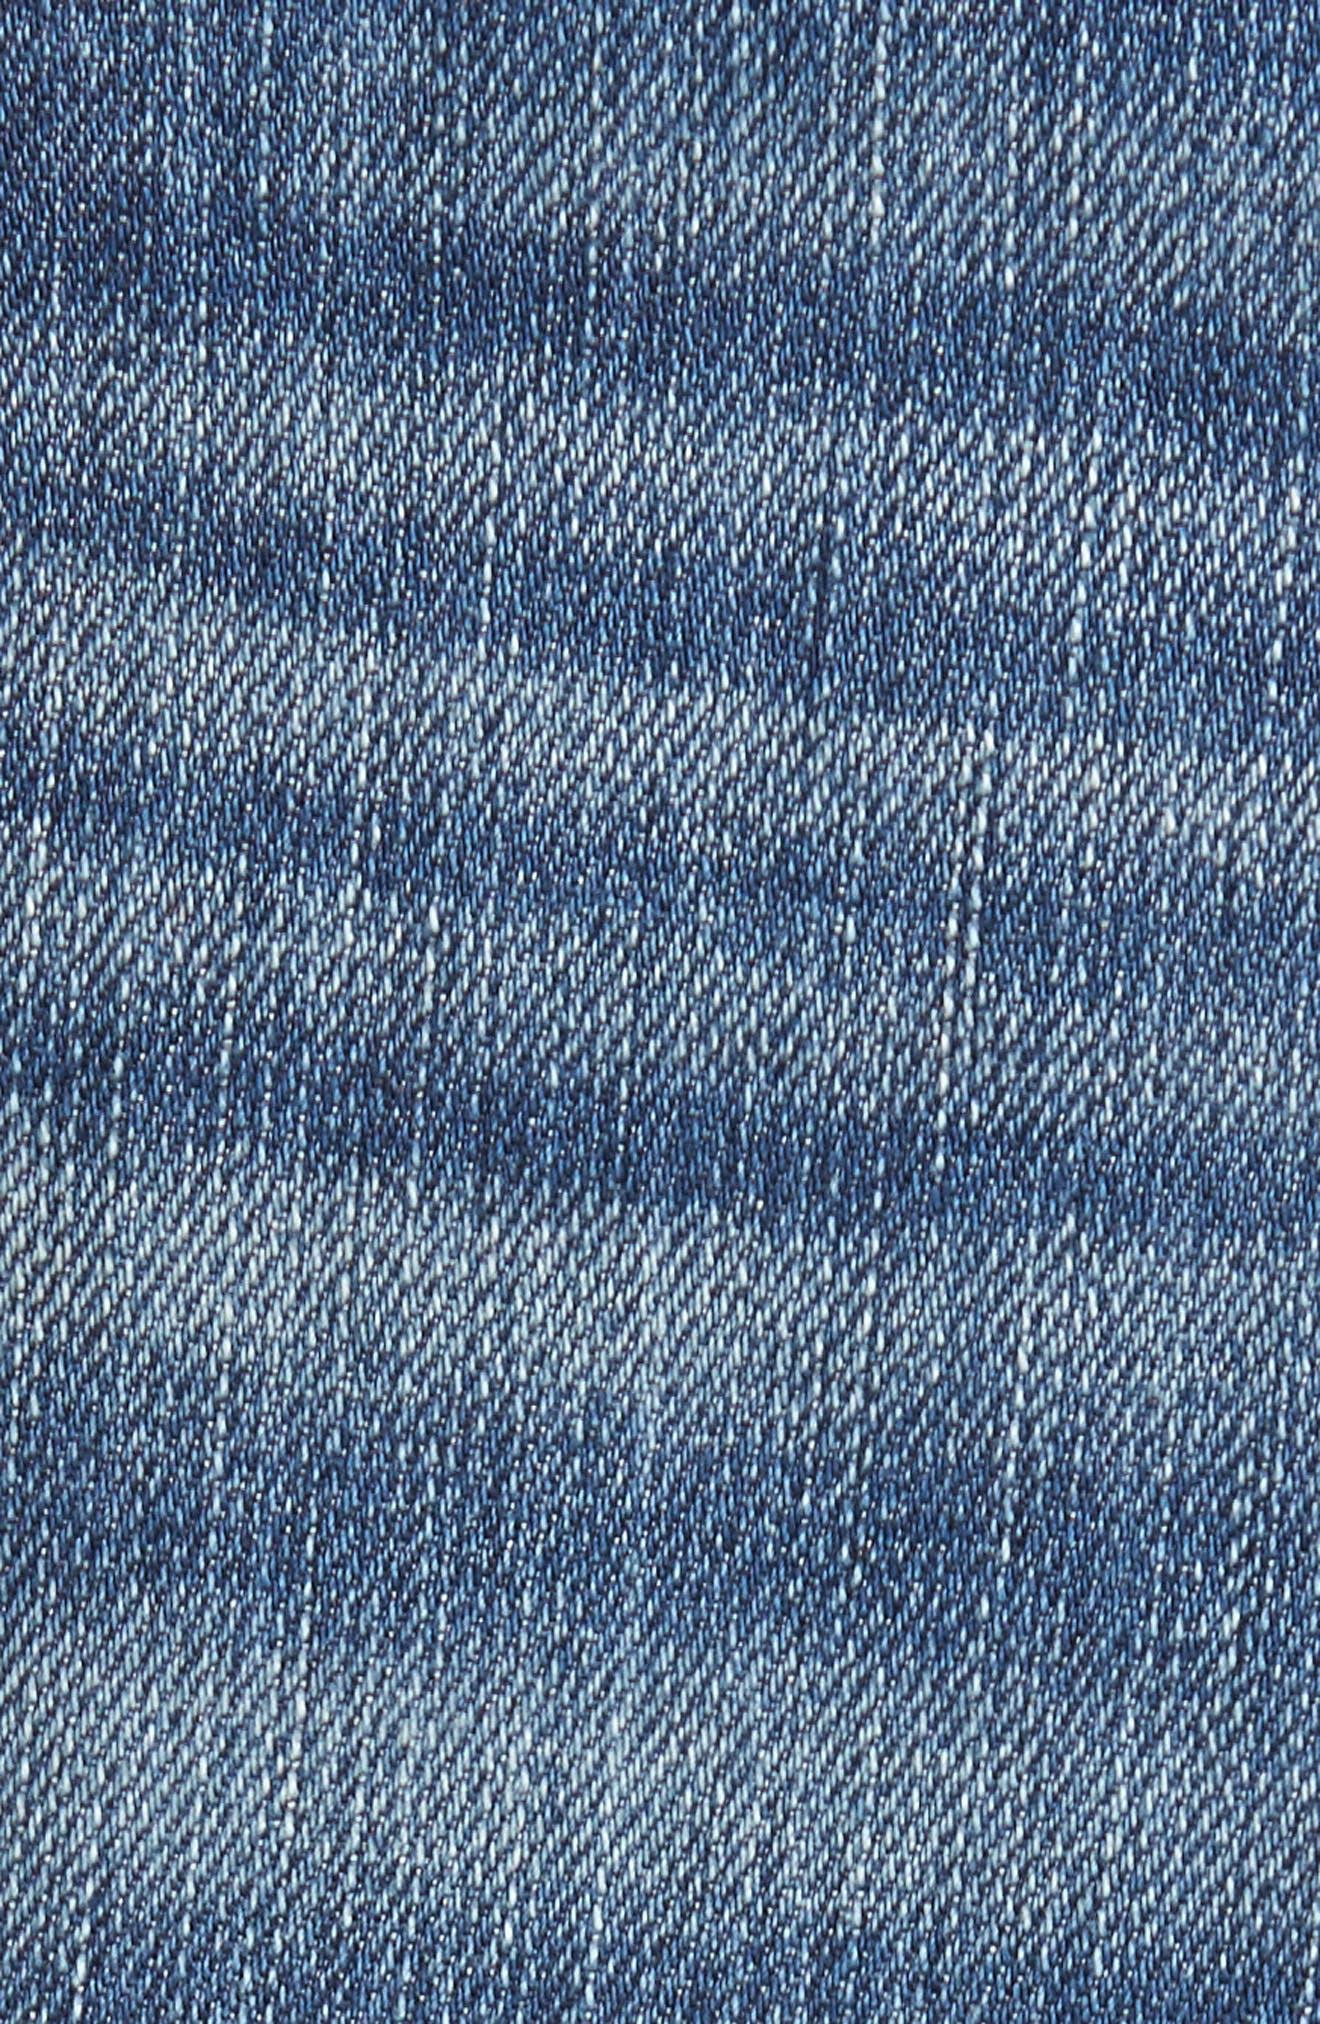 Alternate Image 5  - True Religion Brand Jeans Rocco Skinny Fit Jeans (Indigo Clutch)